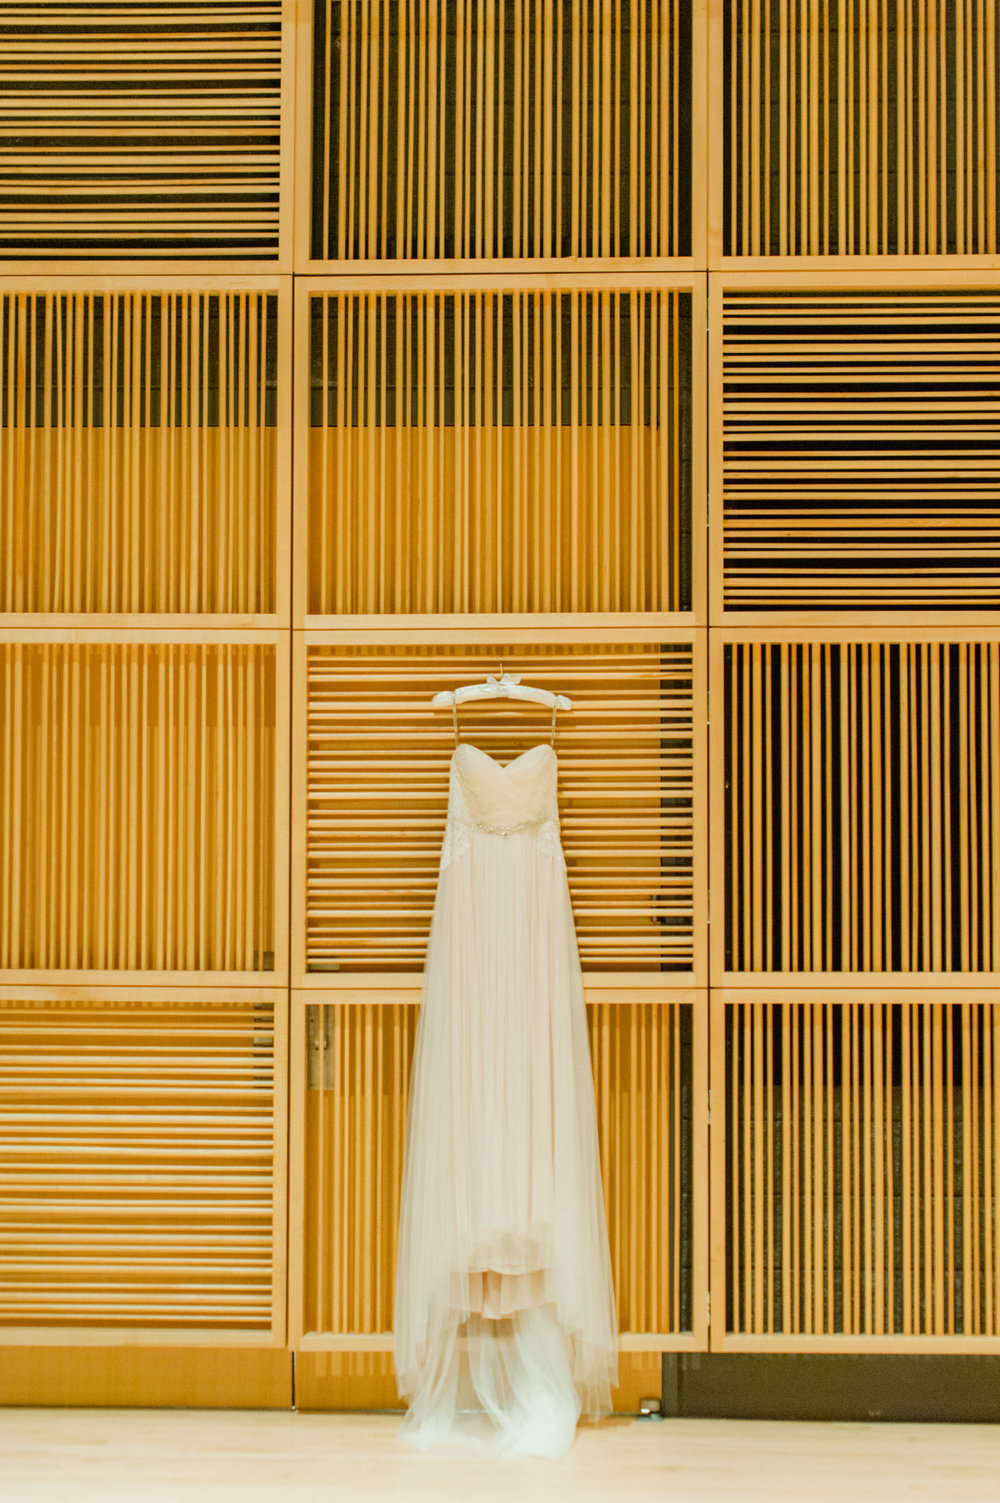 omaha-holland-arts-center-wedding-8.jpg